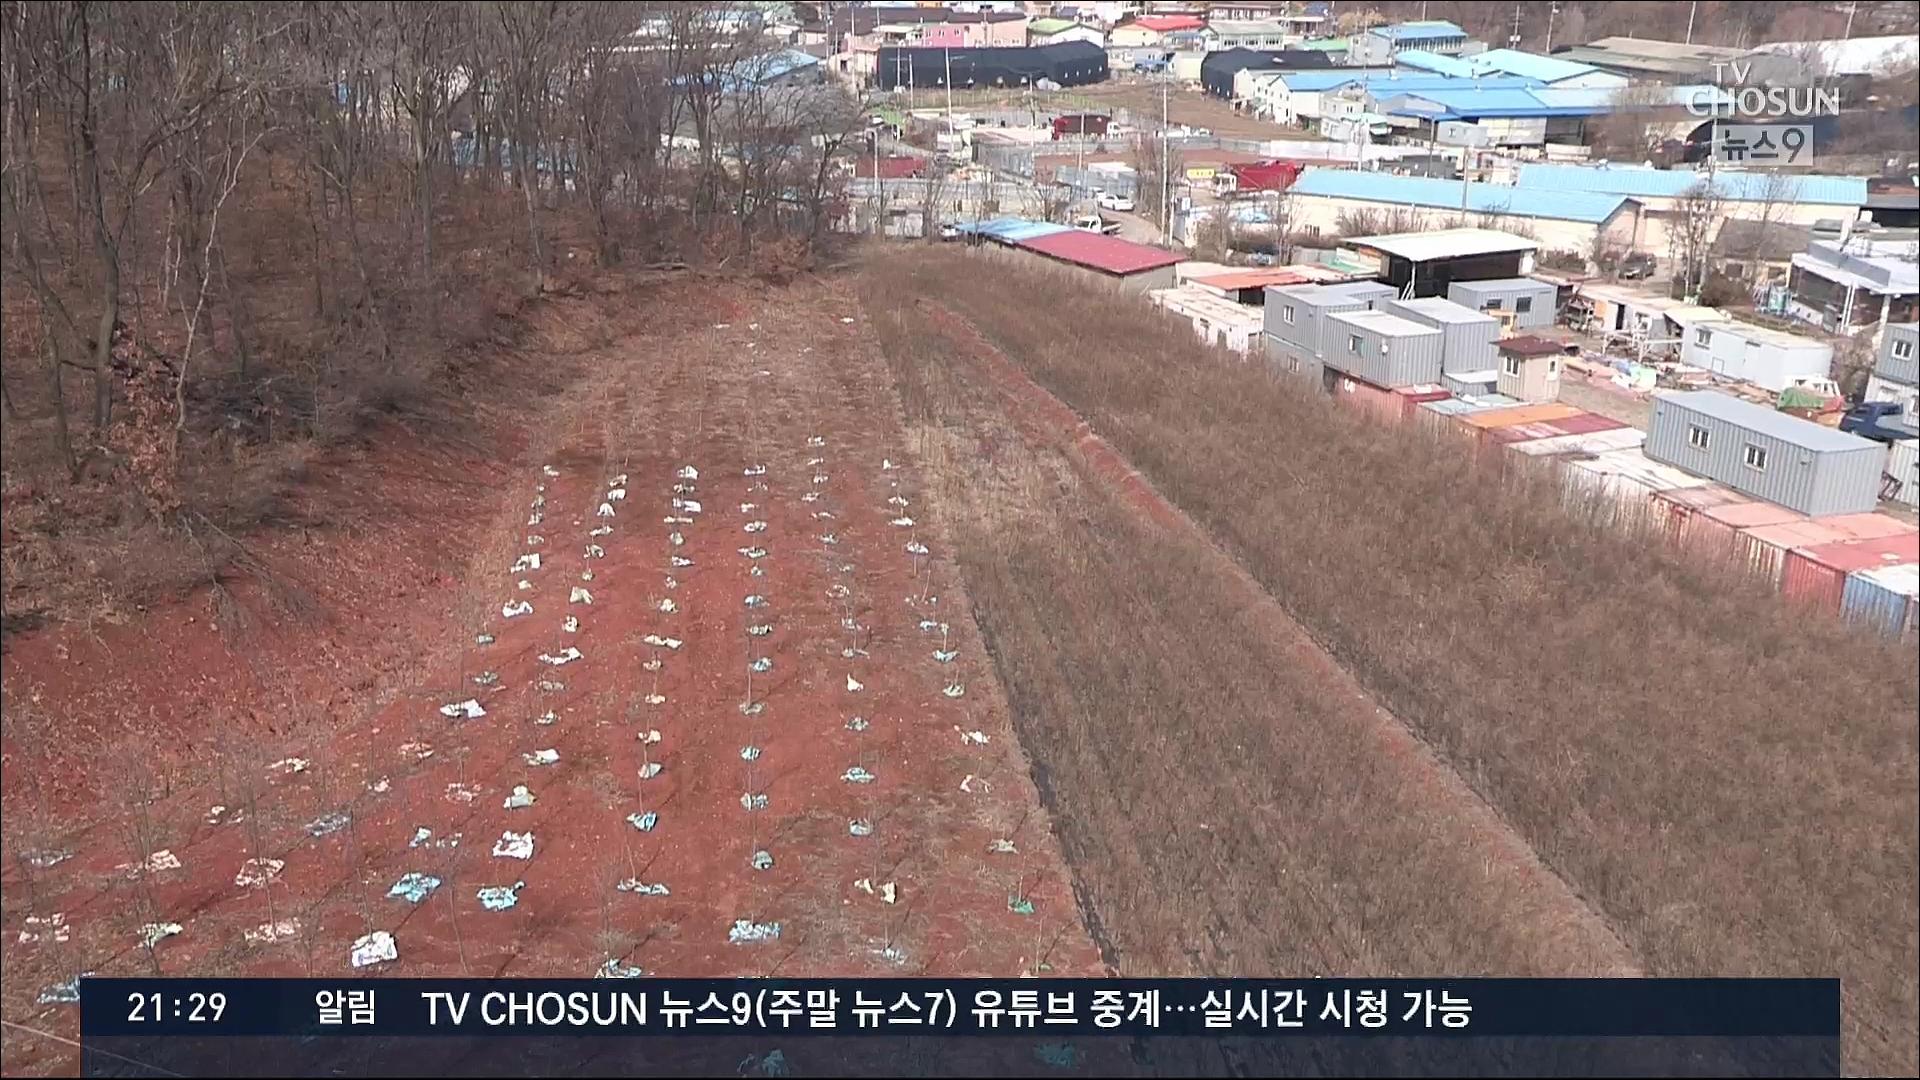 LH직원, 산업단지 발표 8개월 전에도 매입…'땅값 2배 껑충'